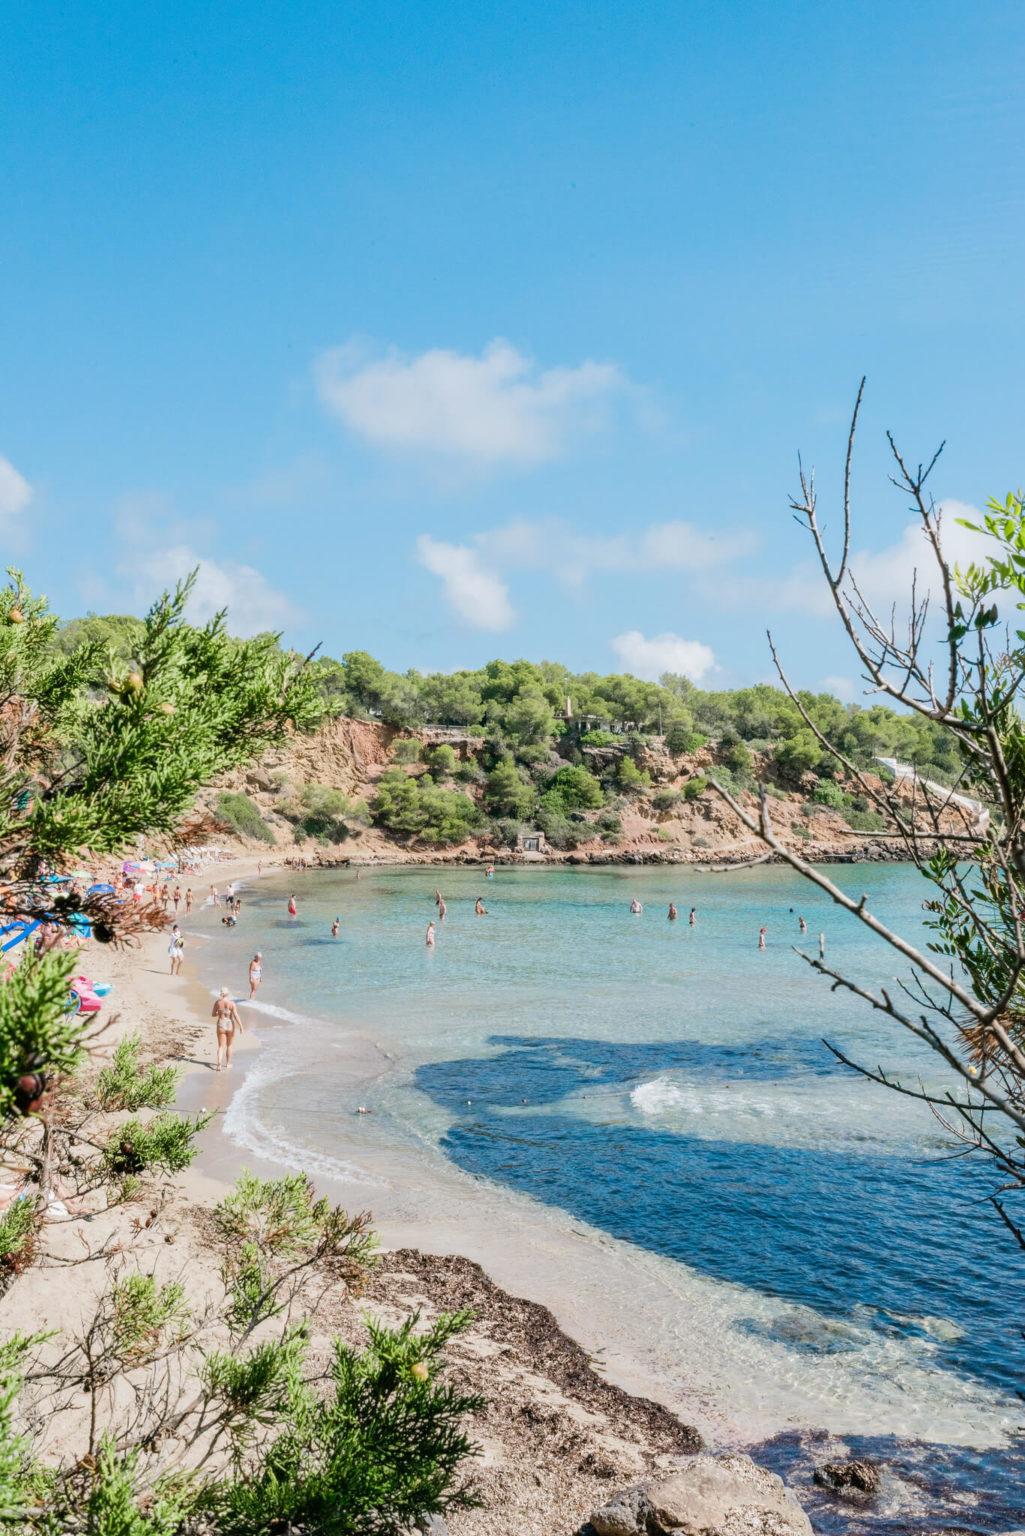 https://www.white-ibiza.com/wp-content/uploads/2020/03/ibiza-beaches-cala-llenya-06-1025x1536.jpg